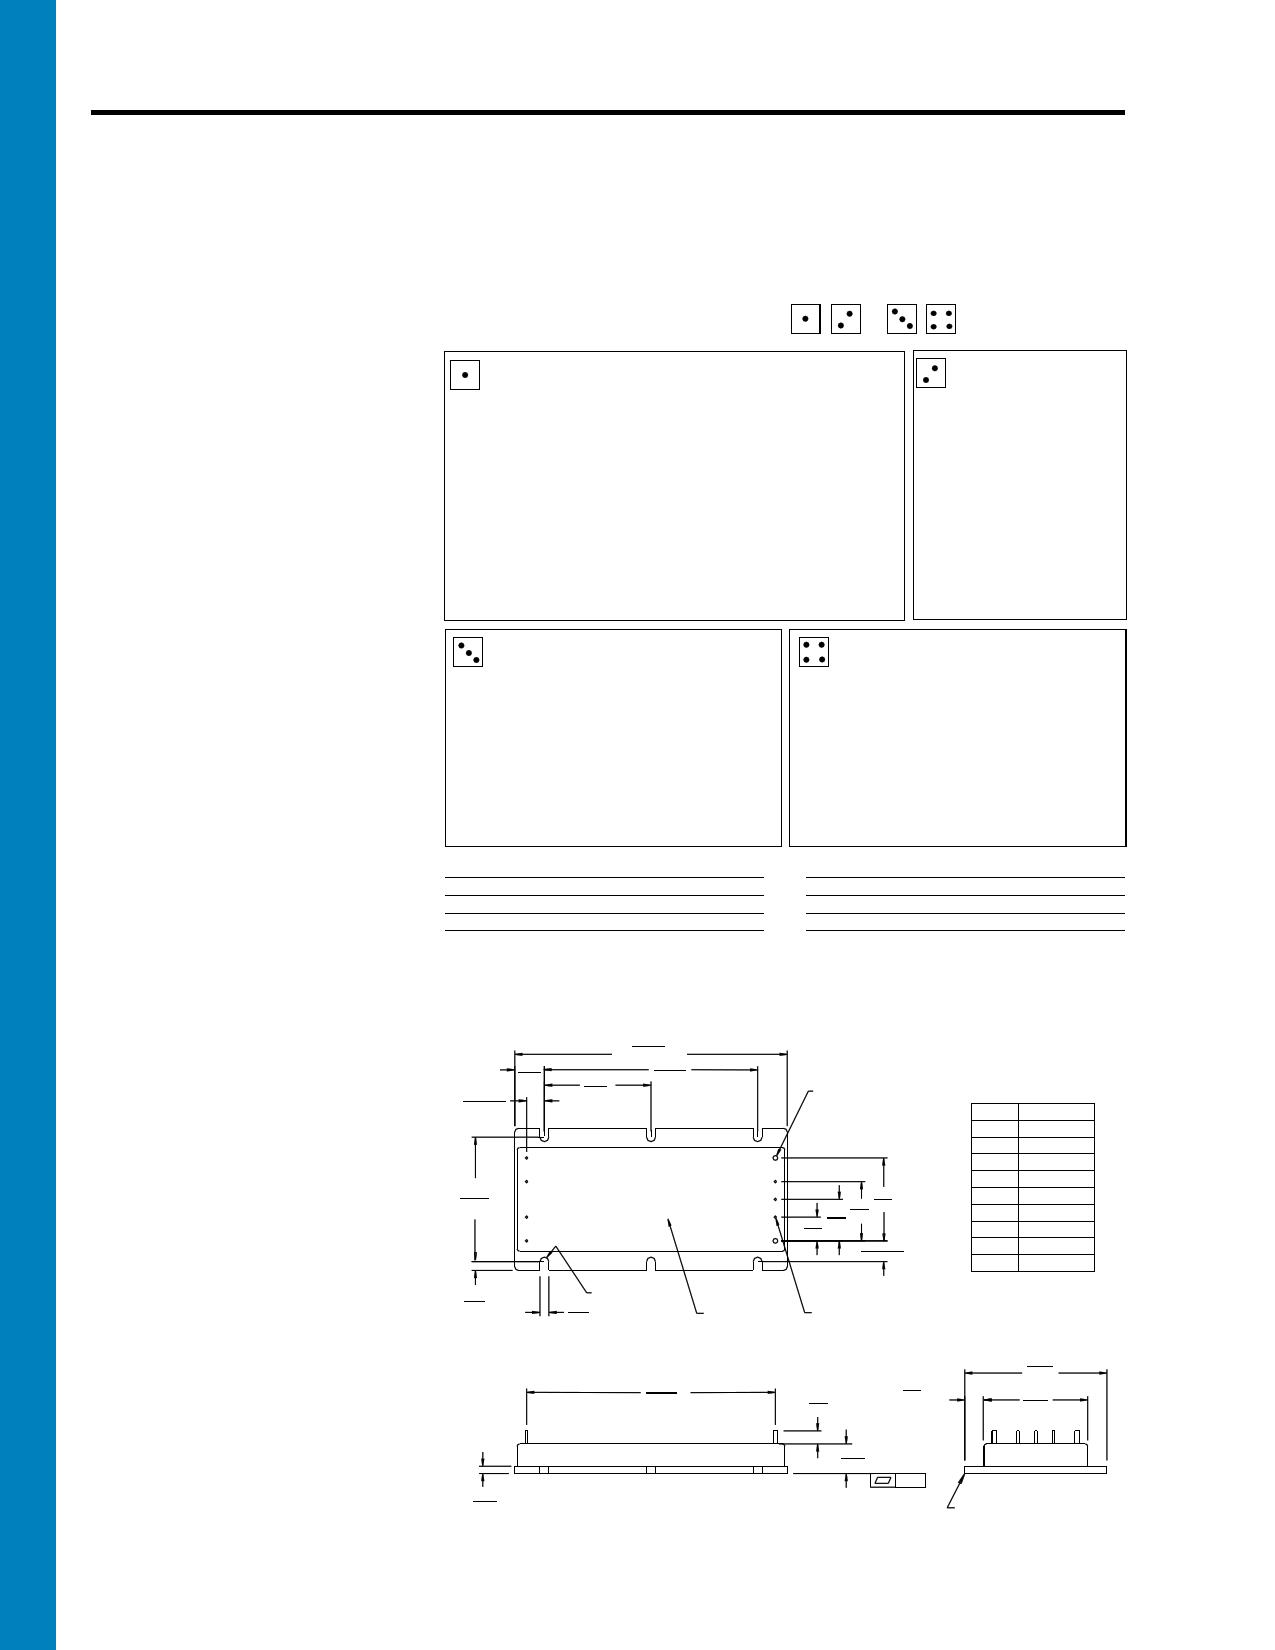 VI-21HIV 데이터시트 및 VI-21HIV PDF